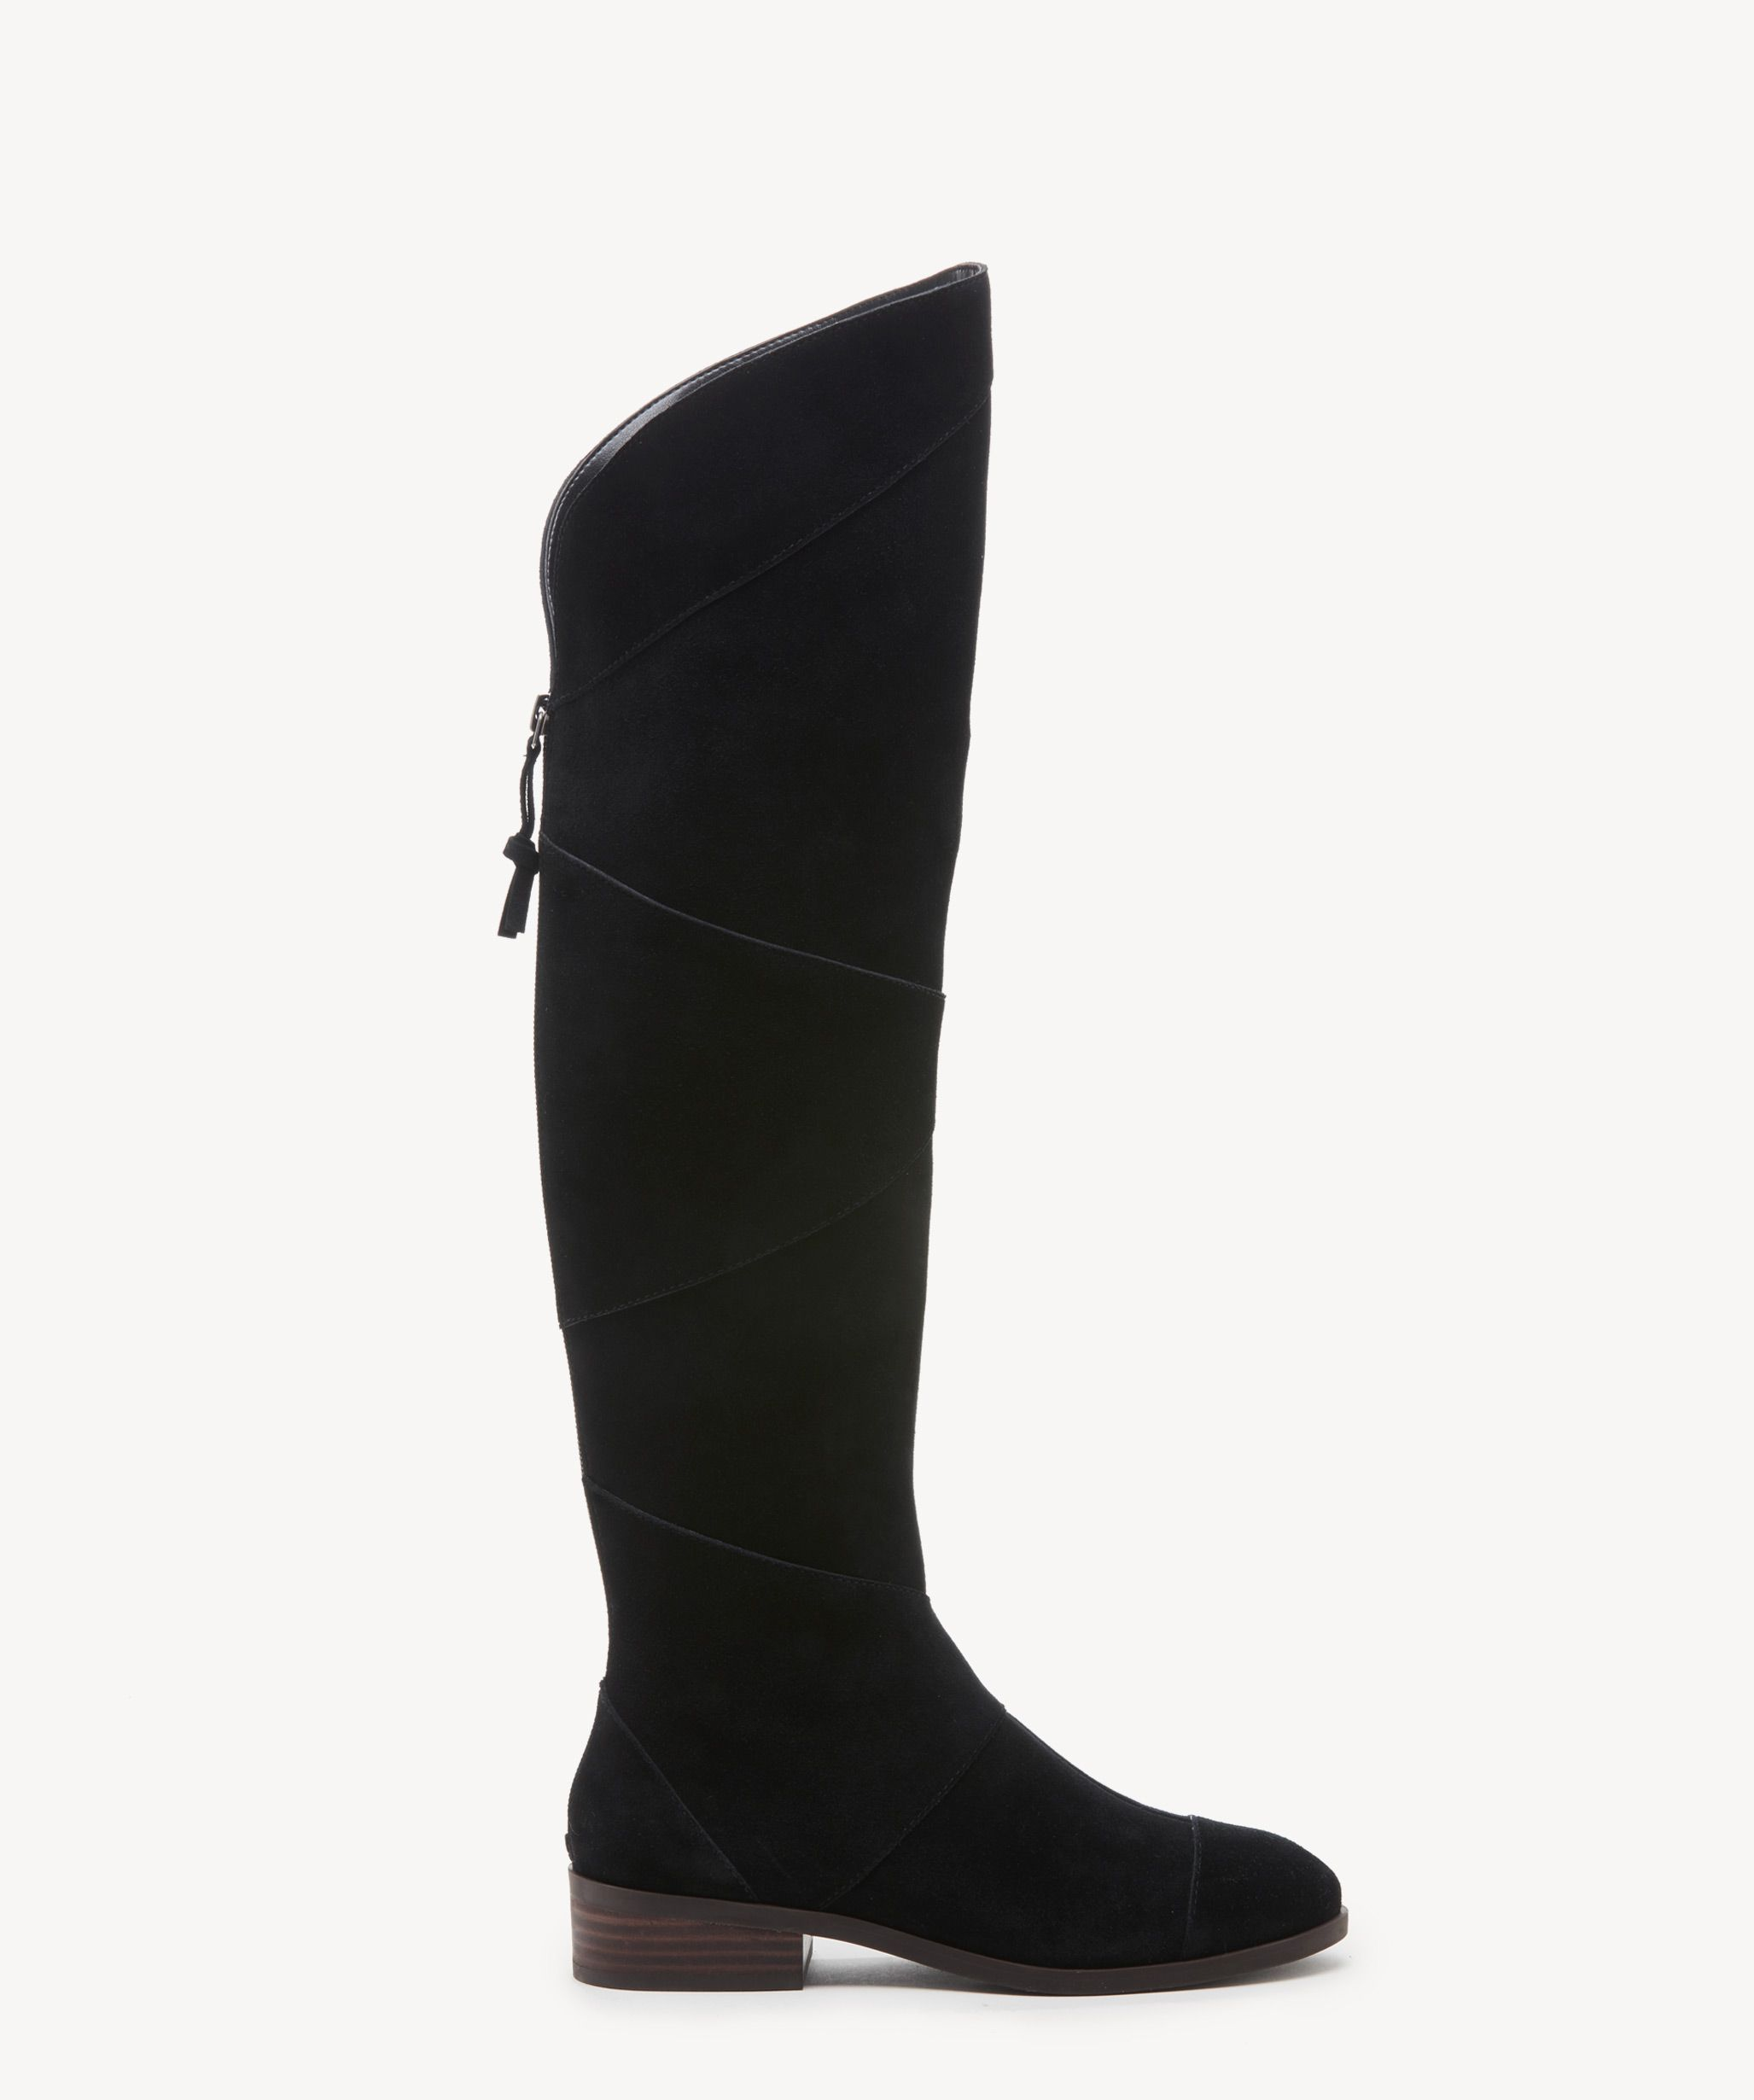 9e4f99dea4a Women s Tiff Otk Boots Black